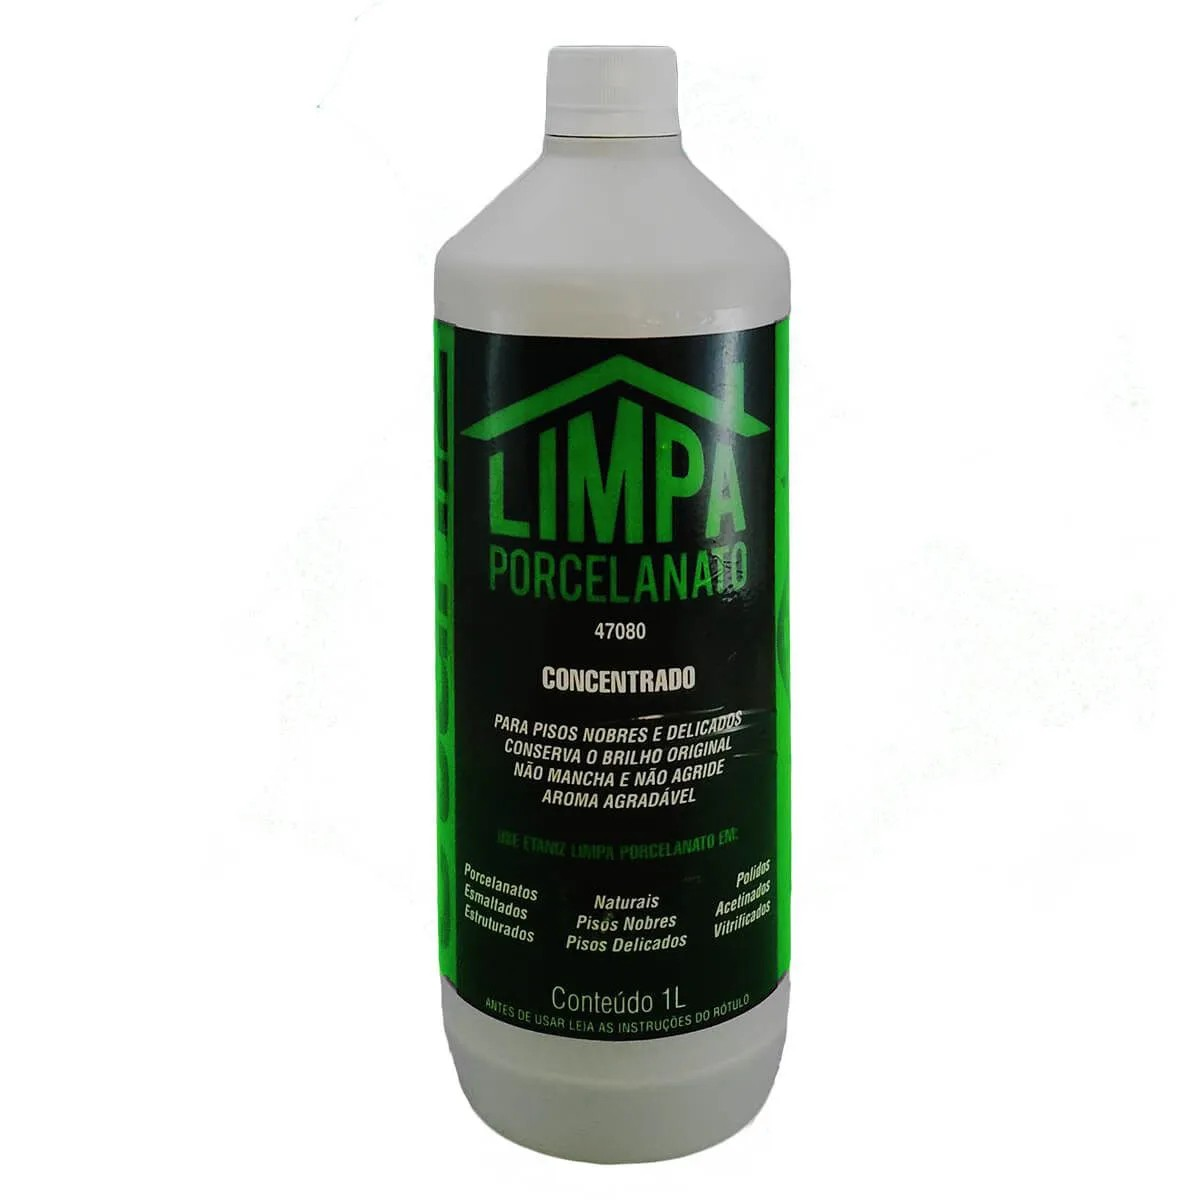 Limpa Porcelanato Concentrado 1 Litro - Etaniz